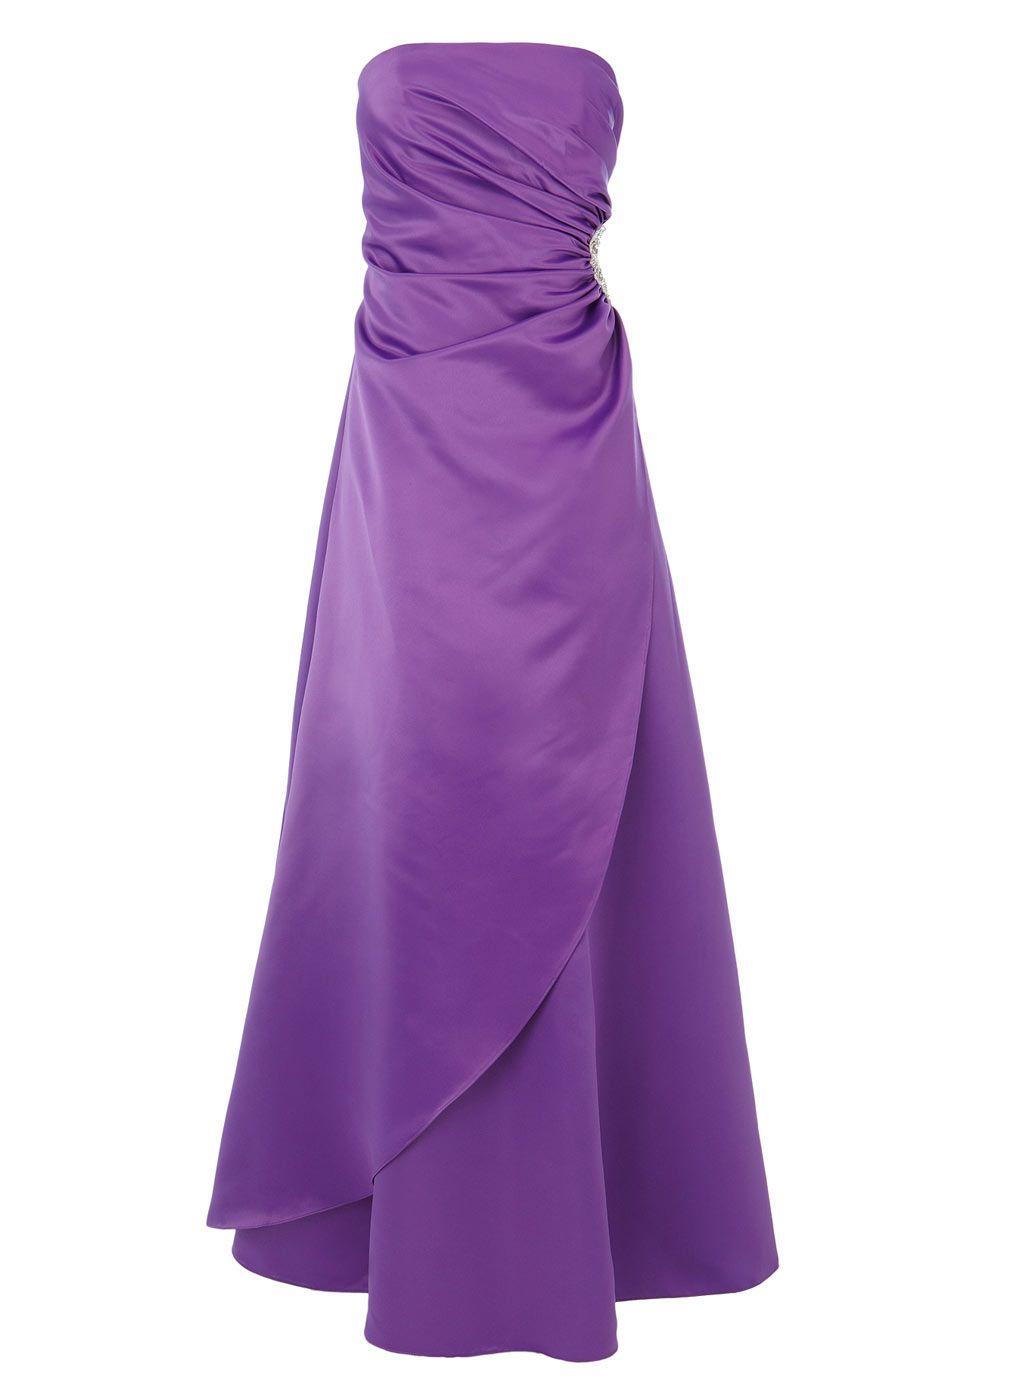 Ella purple satin bridesmaid dress purple shop by colour ella purple satin bridesmaid dress purple shop by colour wedding bhs ombrellifo Gallery